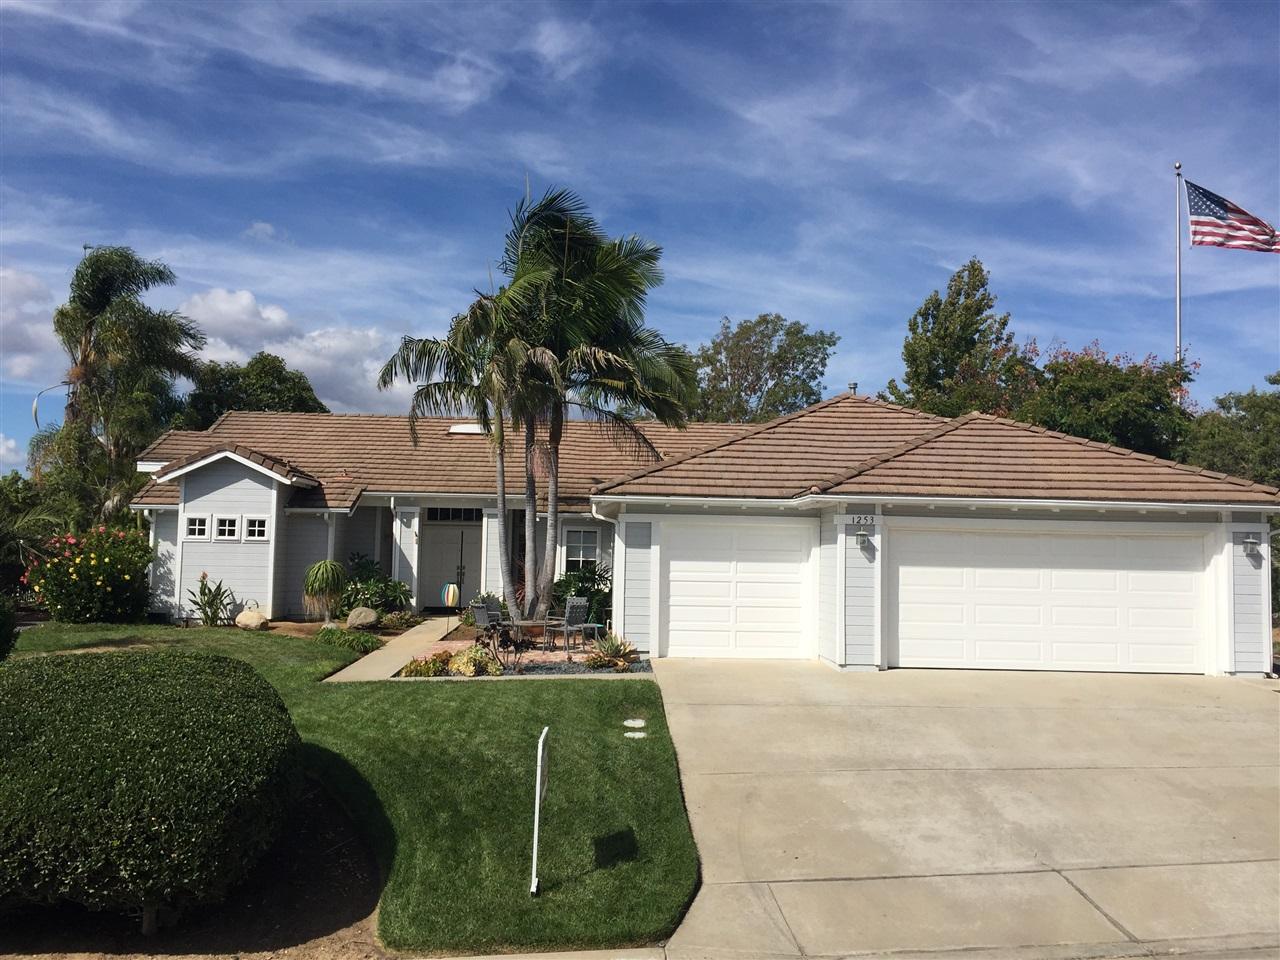 1253 Calle Sonia, Fallbrook, CA 92028